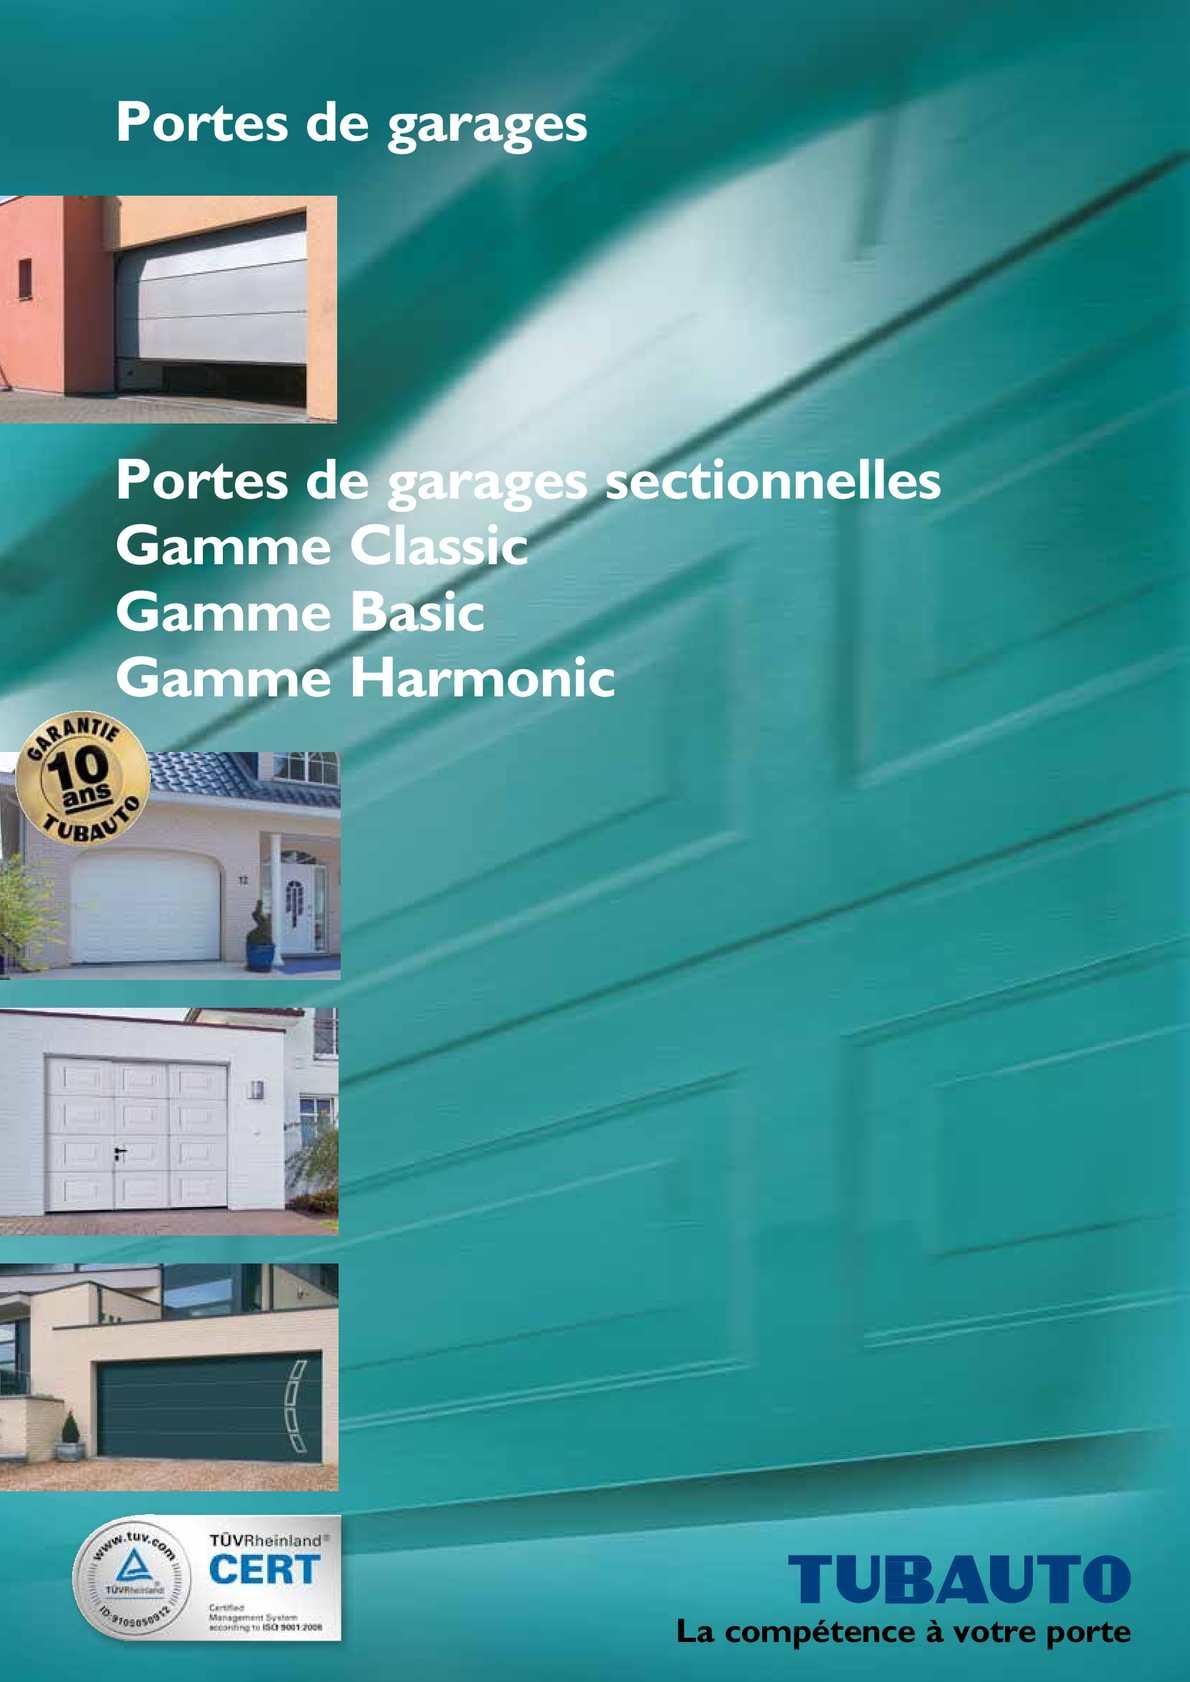 Calam o catalogue tubauto portes de garages sectionnelles for Programmation porte de garage tubauto